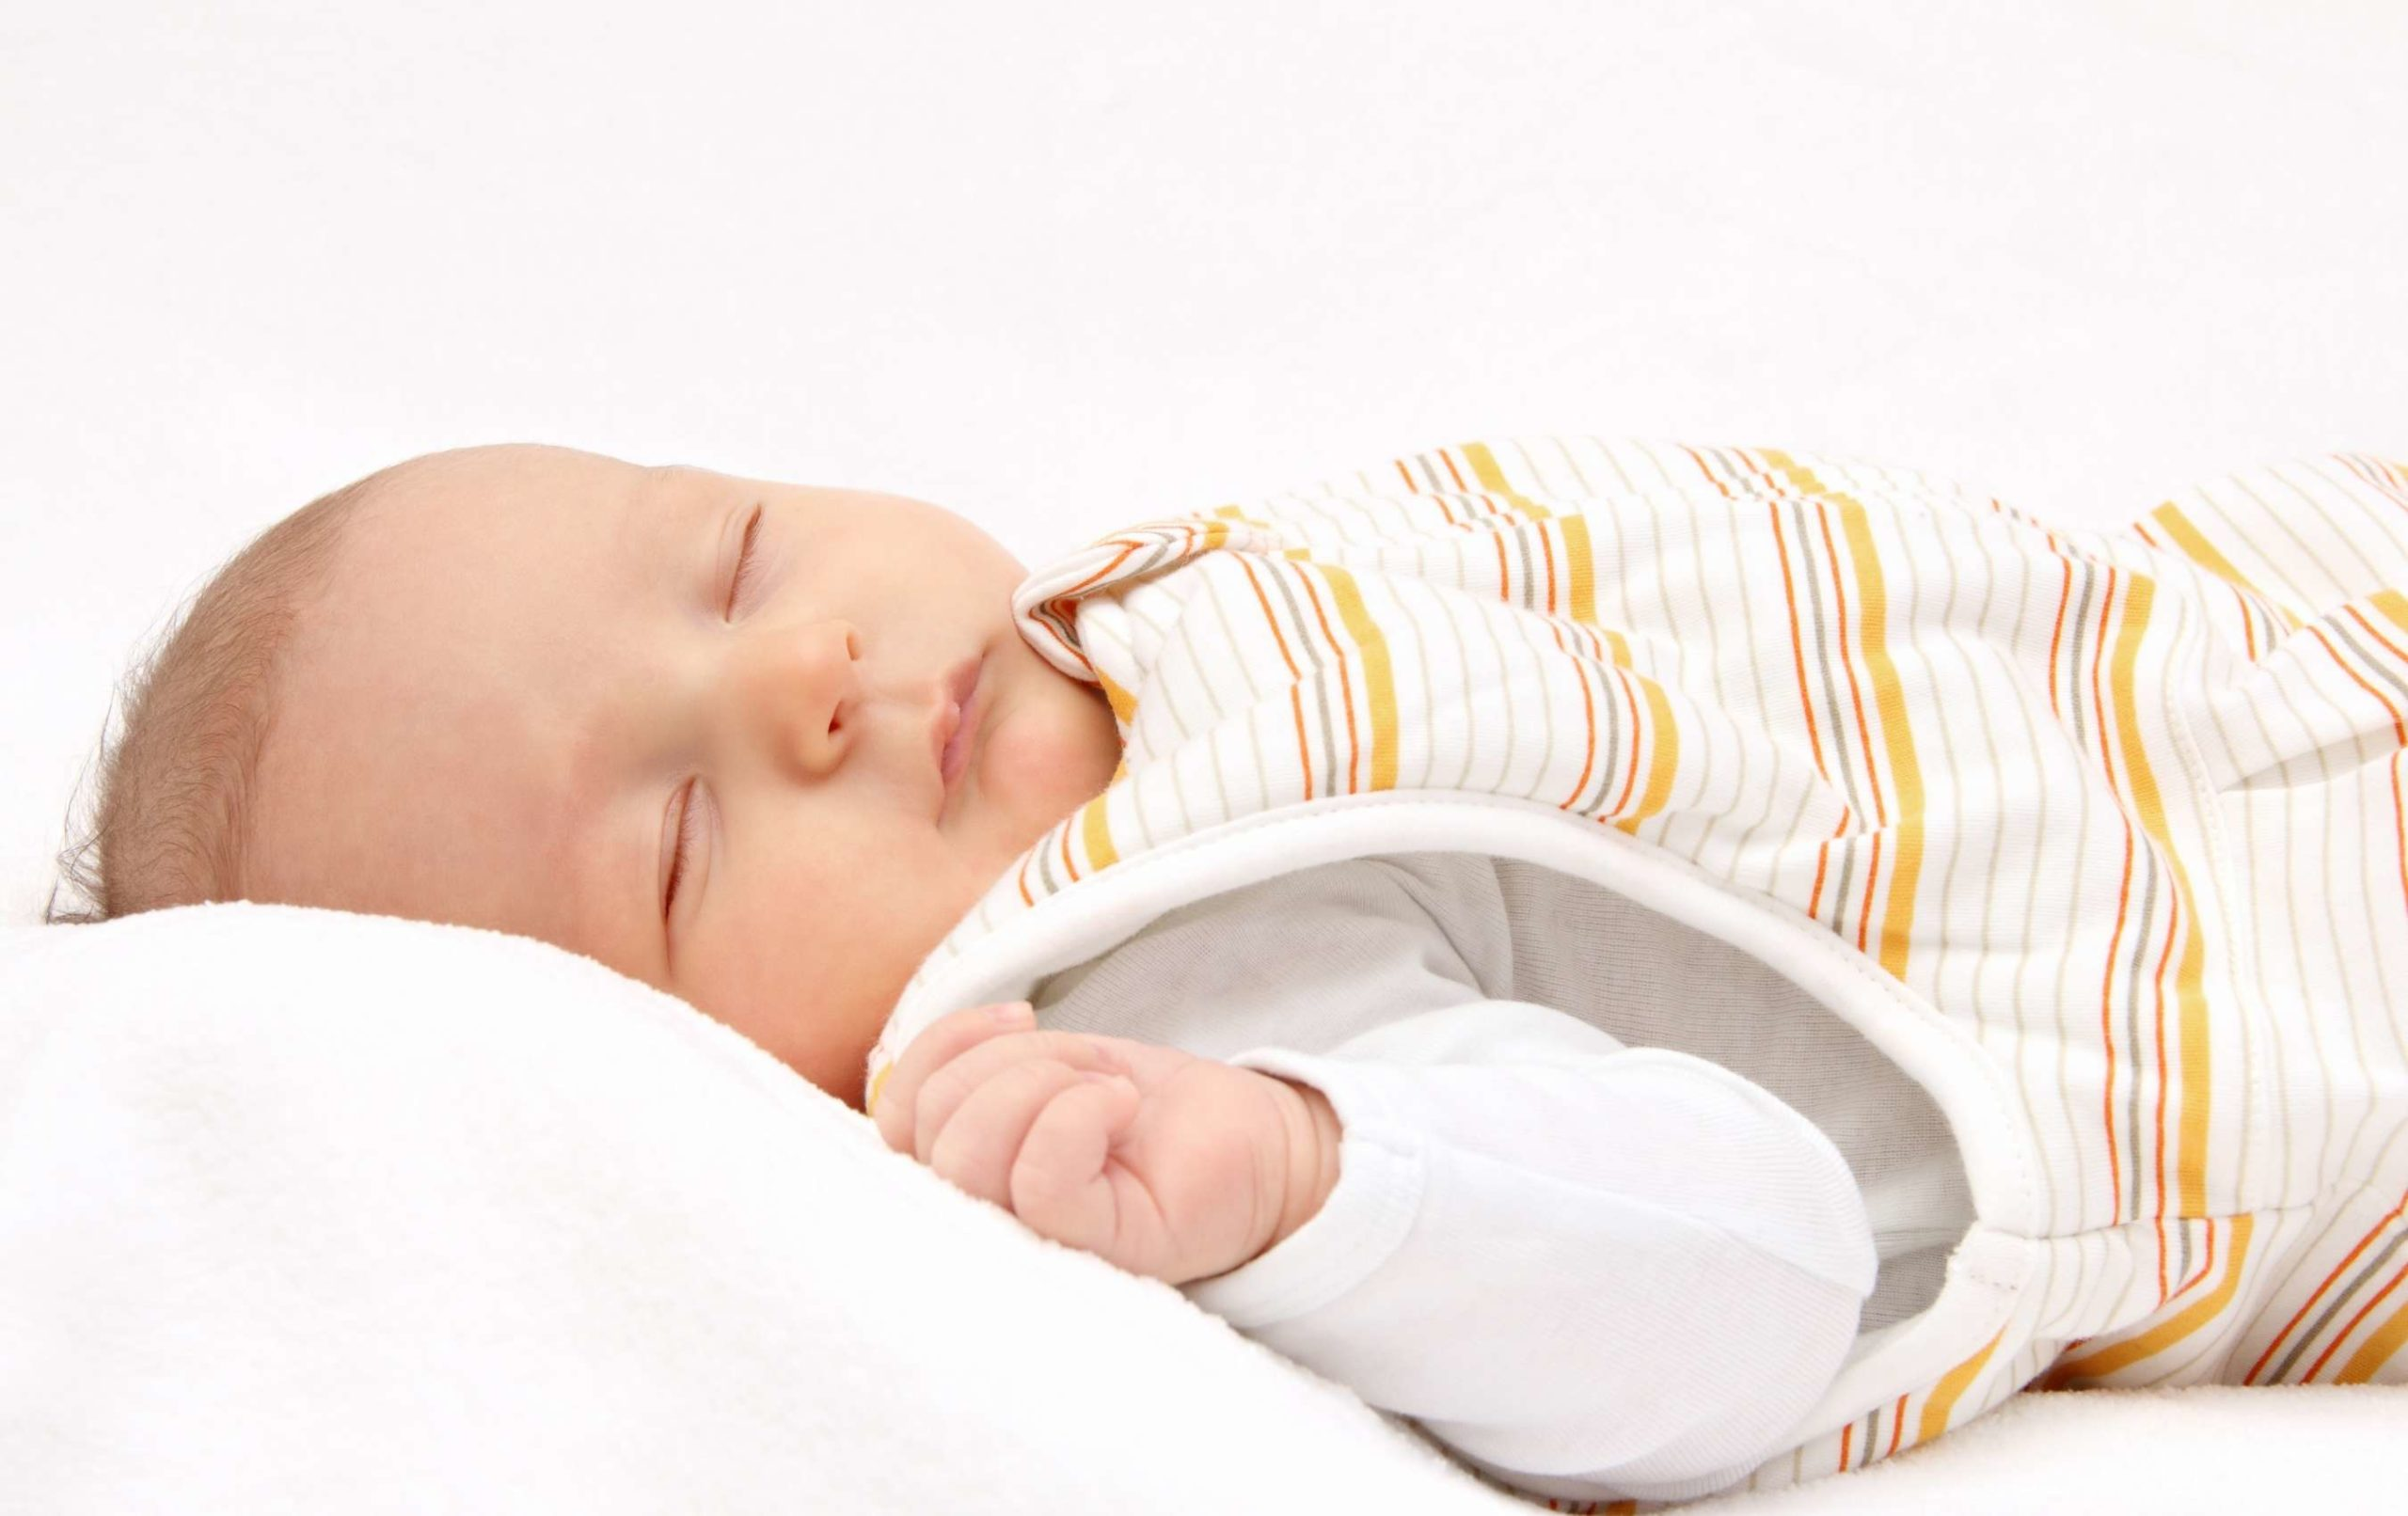 gigoteuse bébé ou turbulette bébé